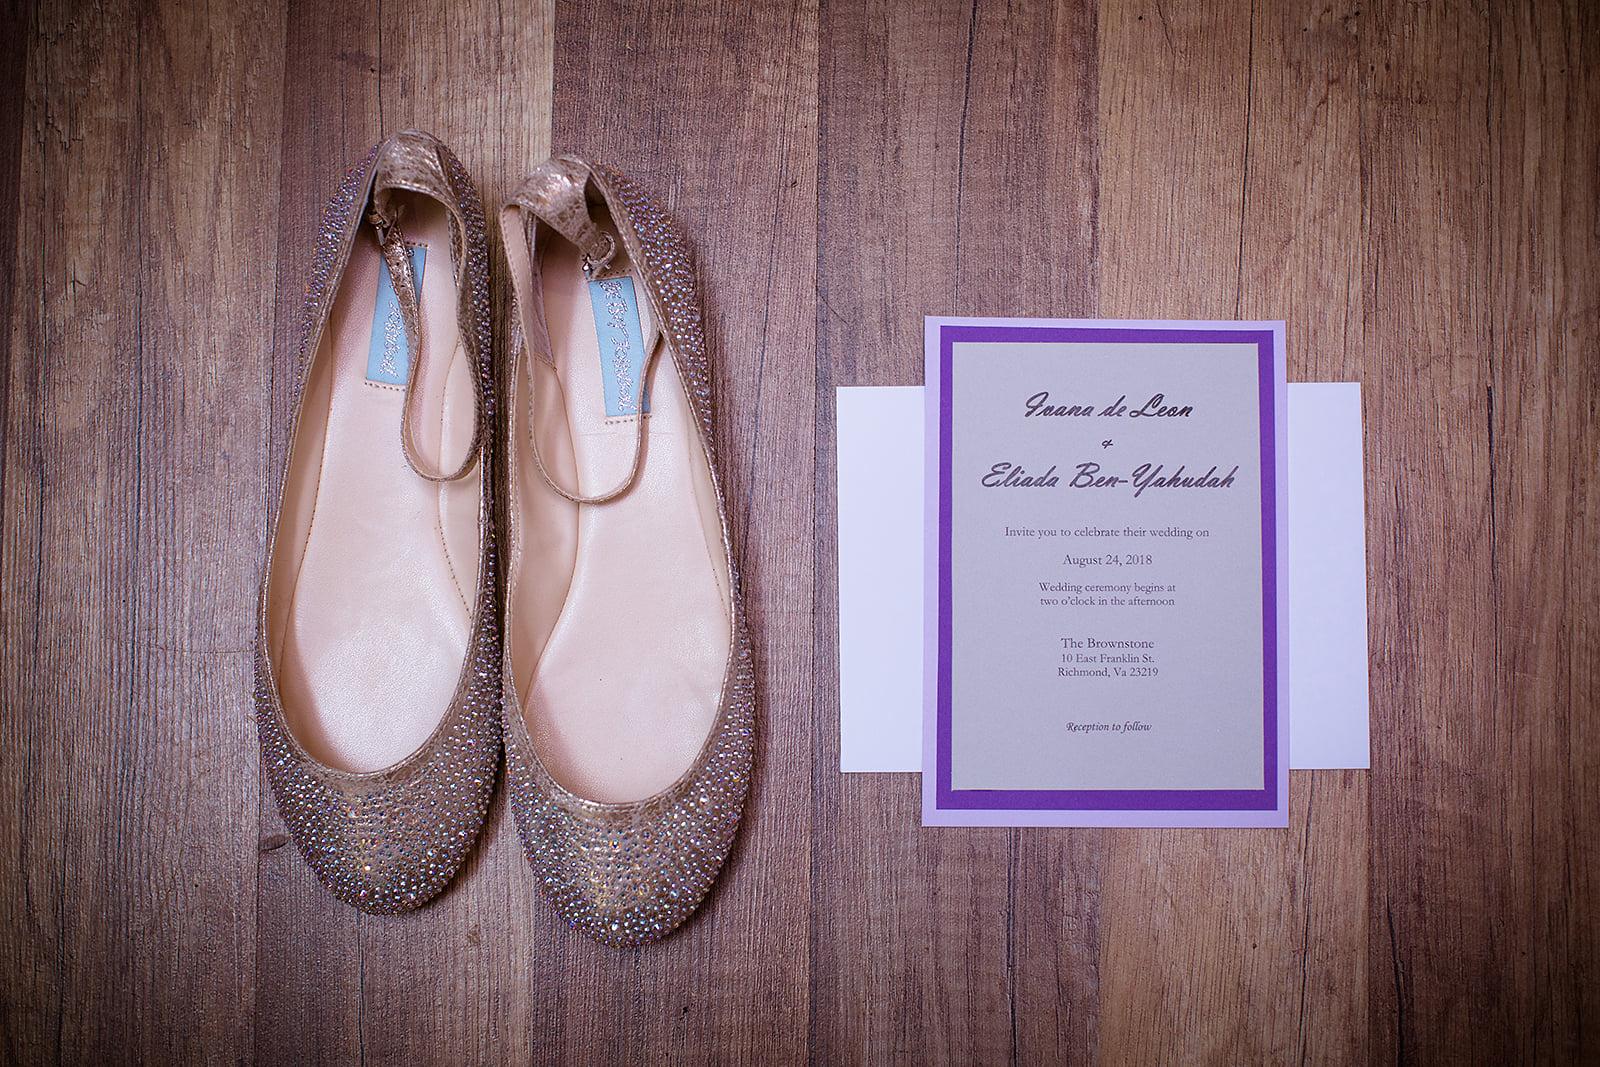 BenYahudah Wedding- Details-5.jpg